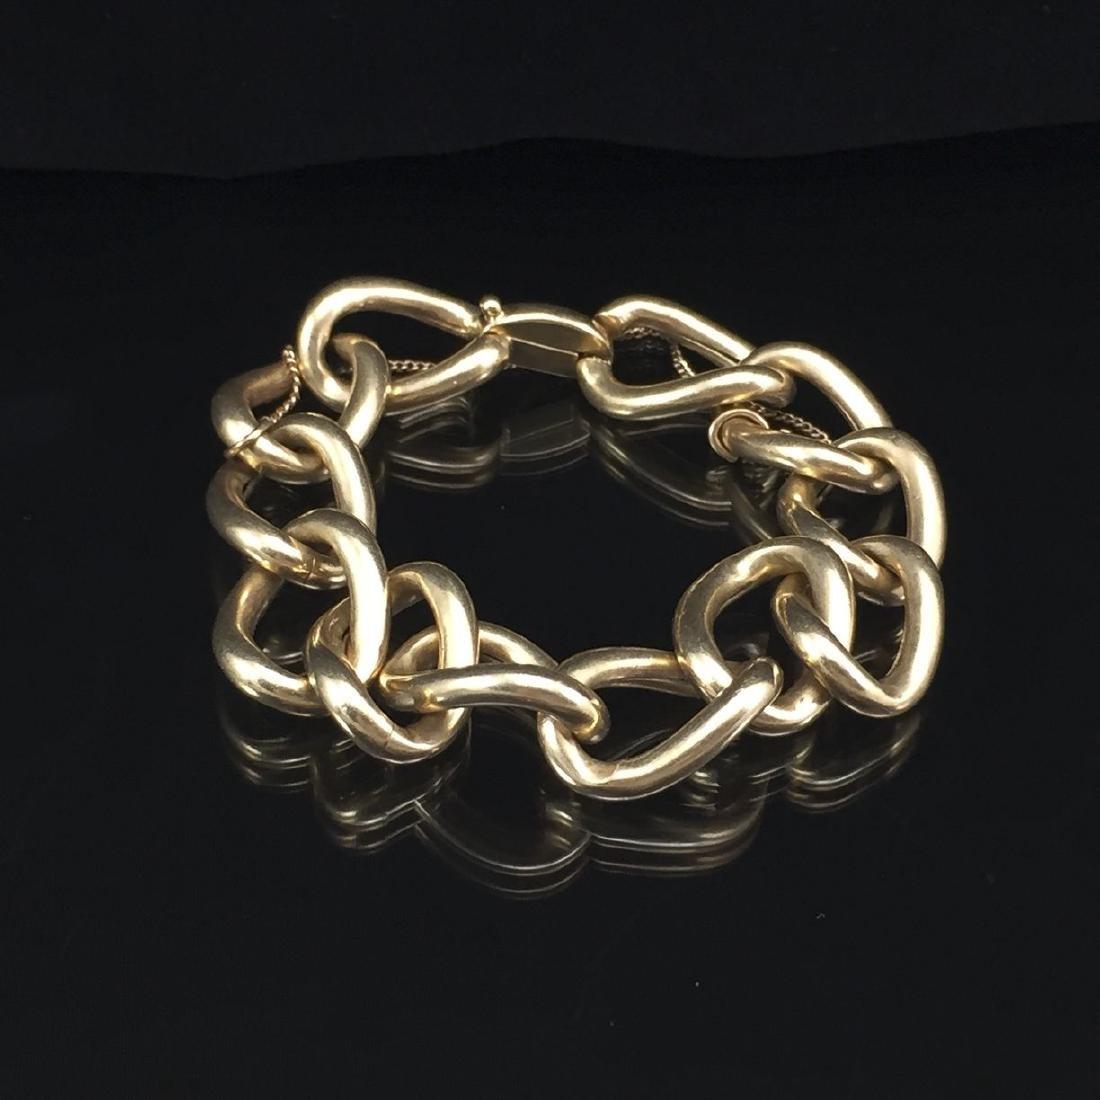 Beautiful 14k Gold Hollow Link Bracelet - 7